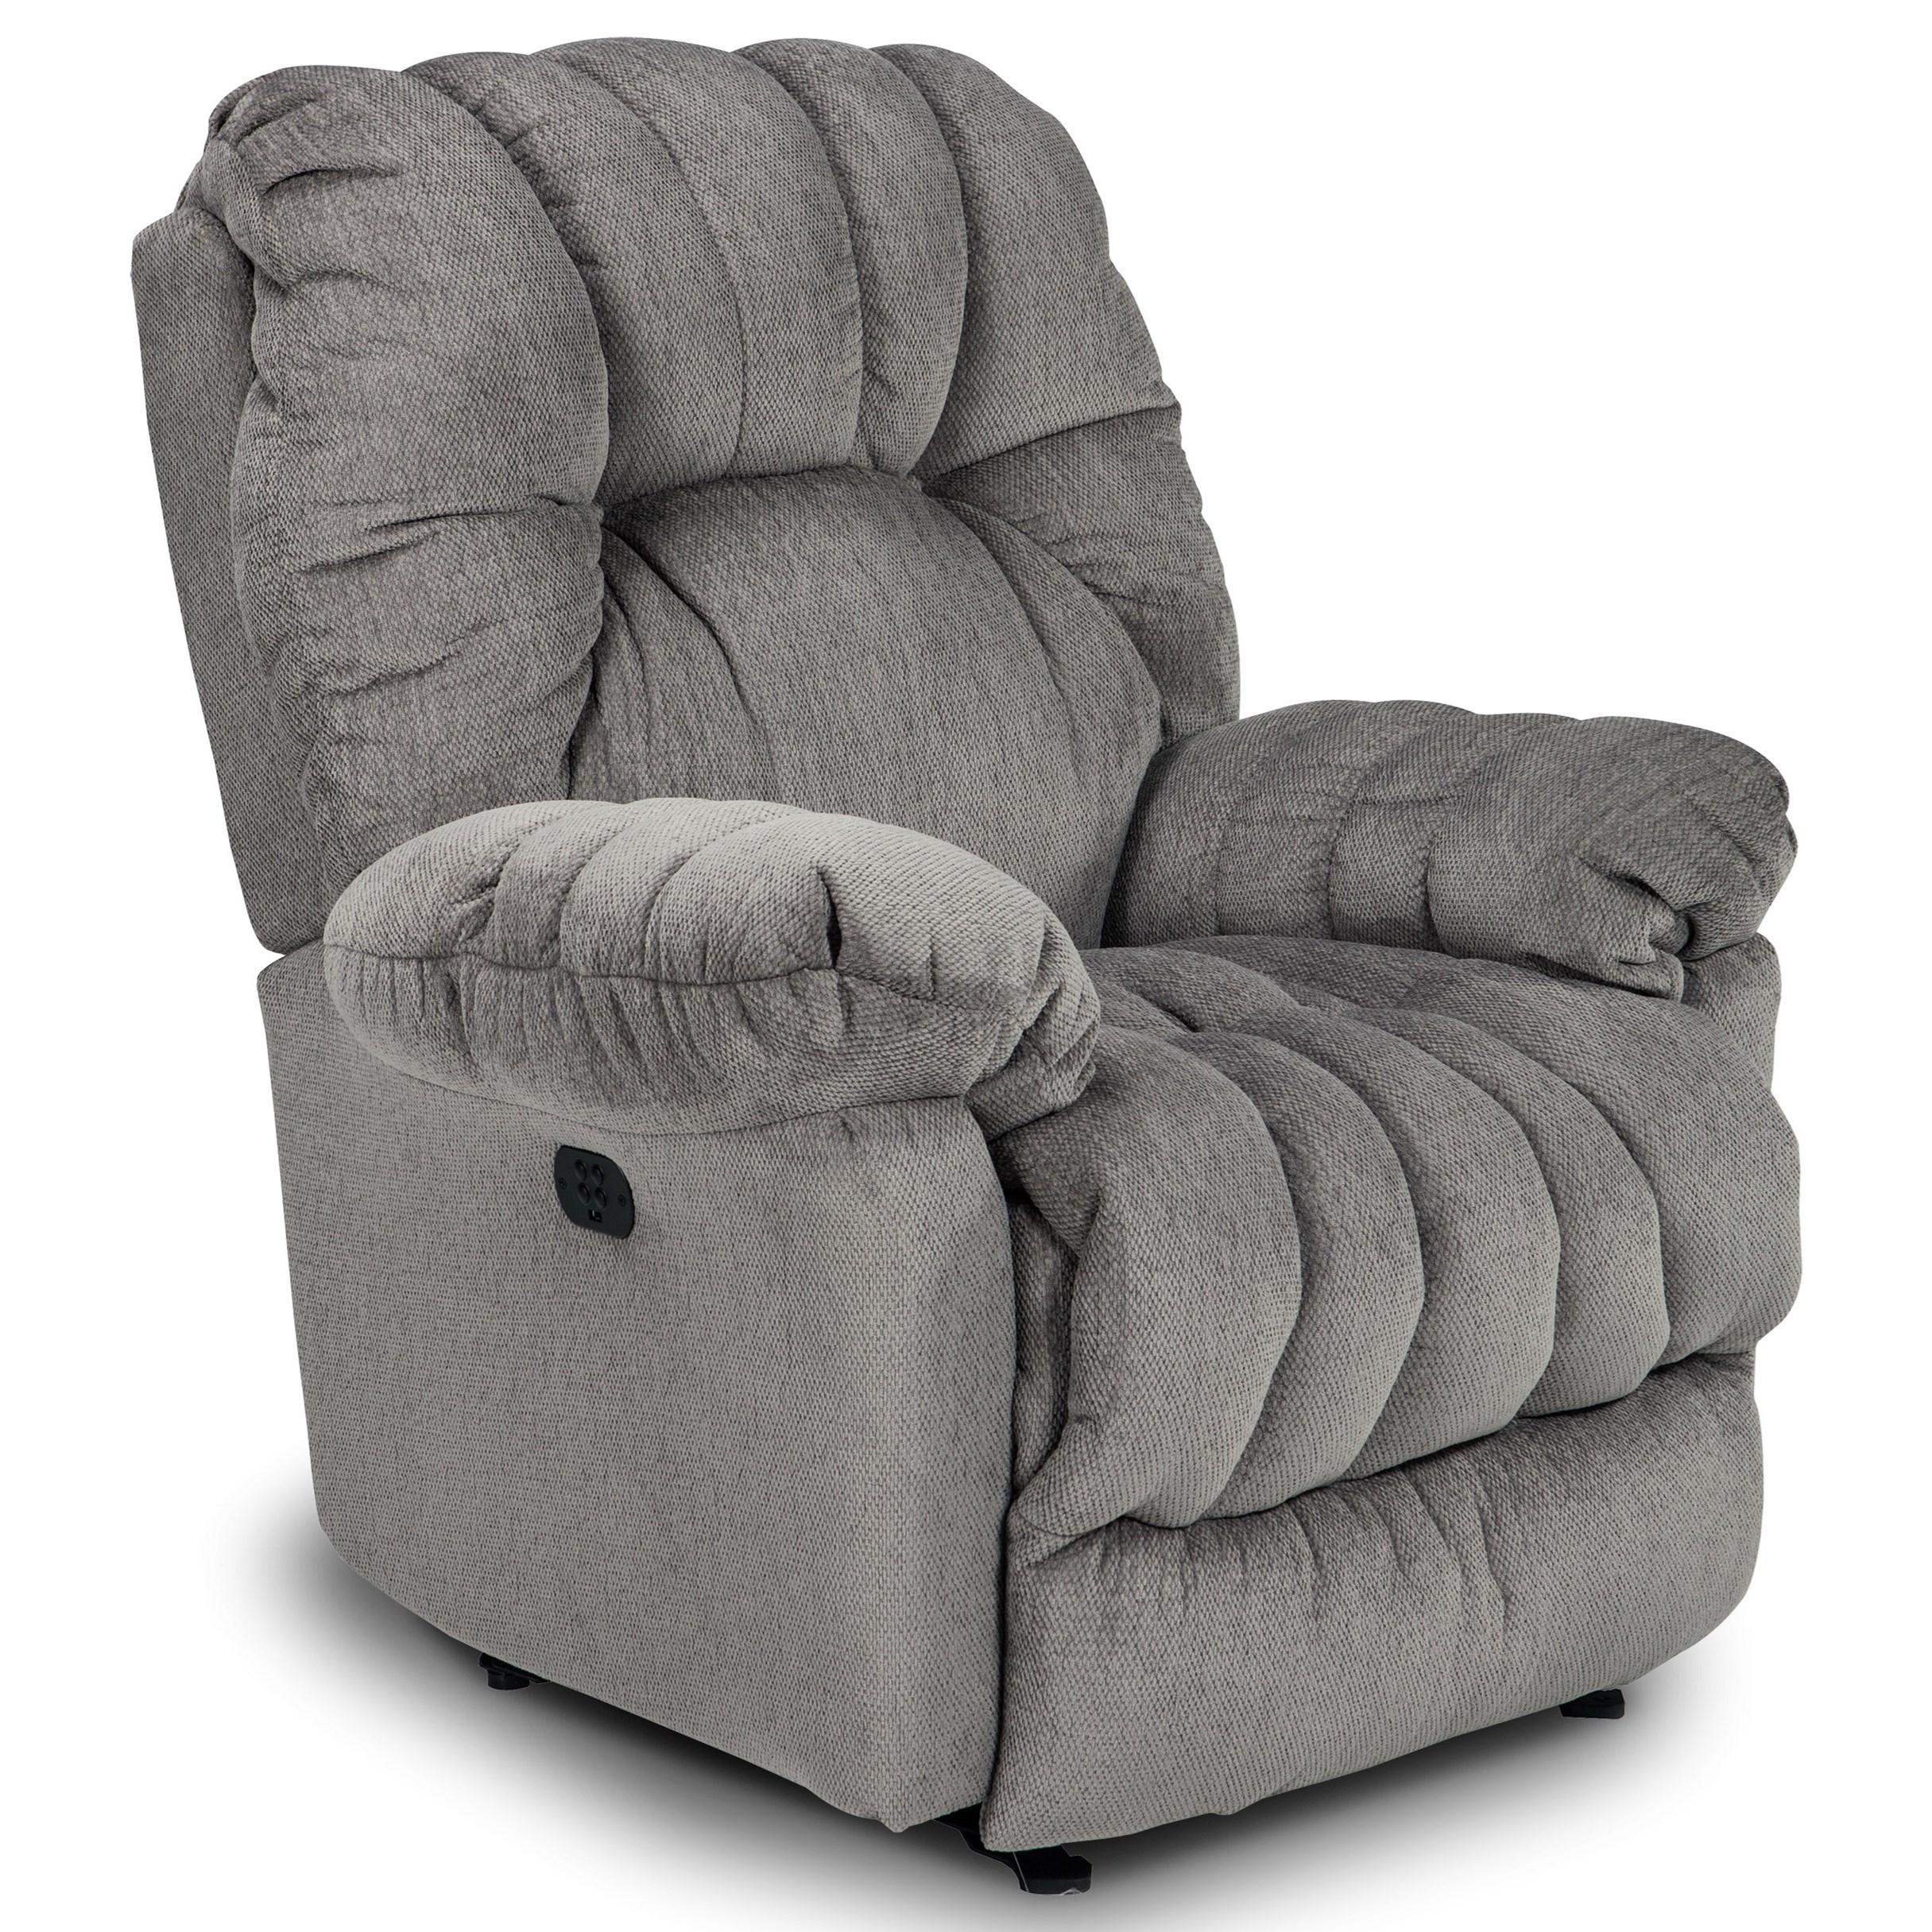 walgreens lift chairs electric deck target best home furnishings recliners medium conen power